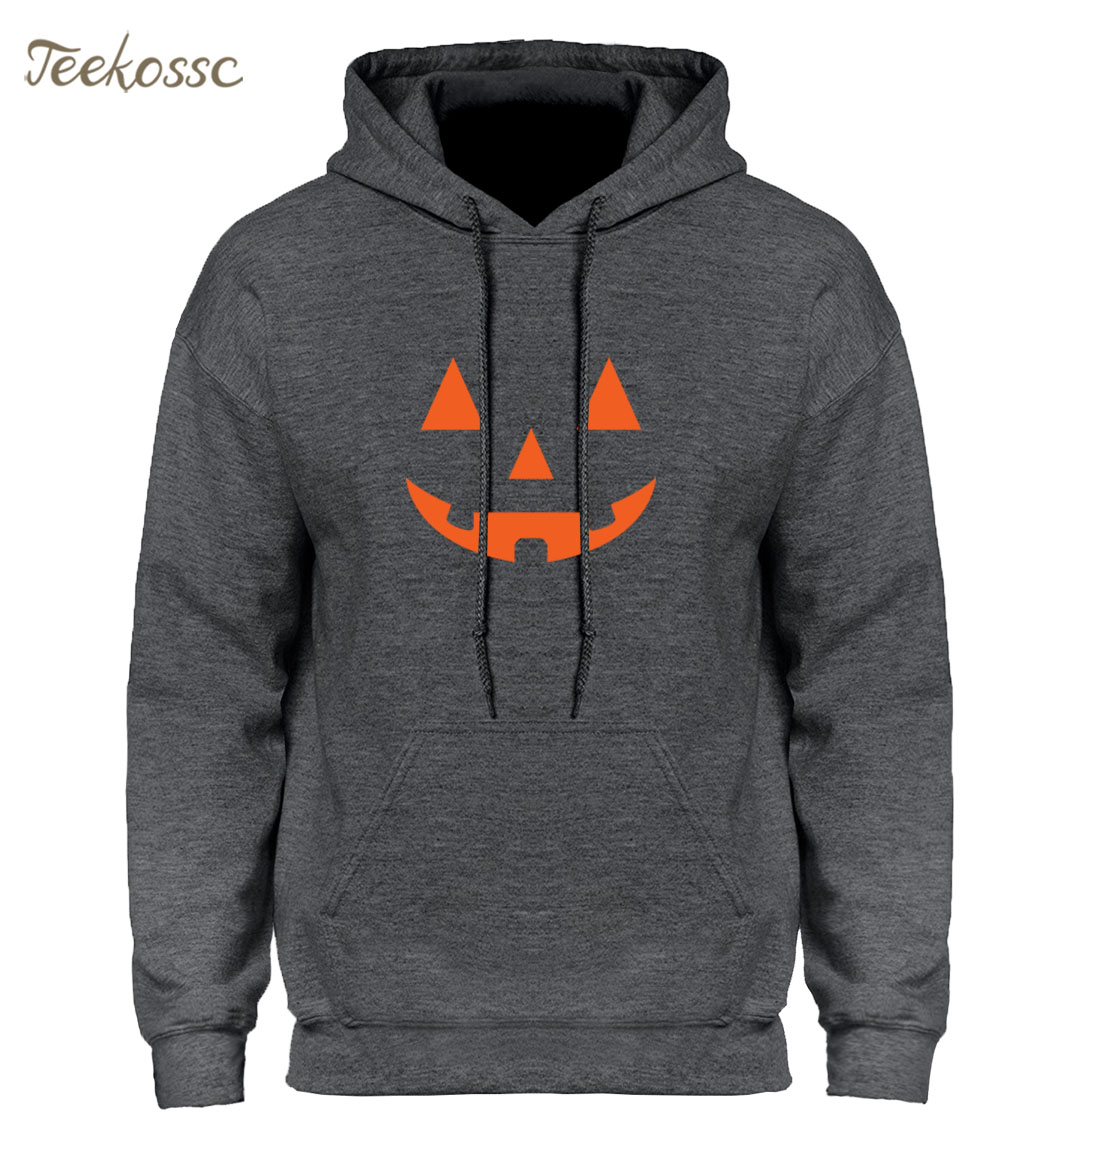 Hoodies & Sweatshirts Jack O Lantern Pumpkin Halloween Clothing Hoodies Sweatshirts Men 2018 New Winter Autumn Hooded Hoody Holiday Costumes Hoodie